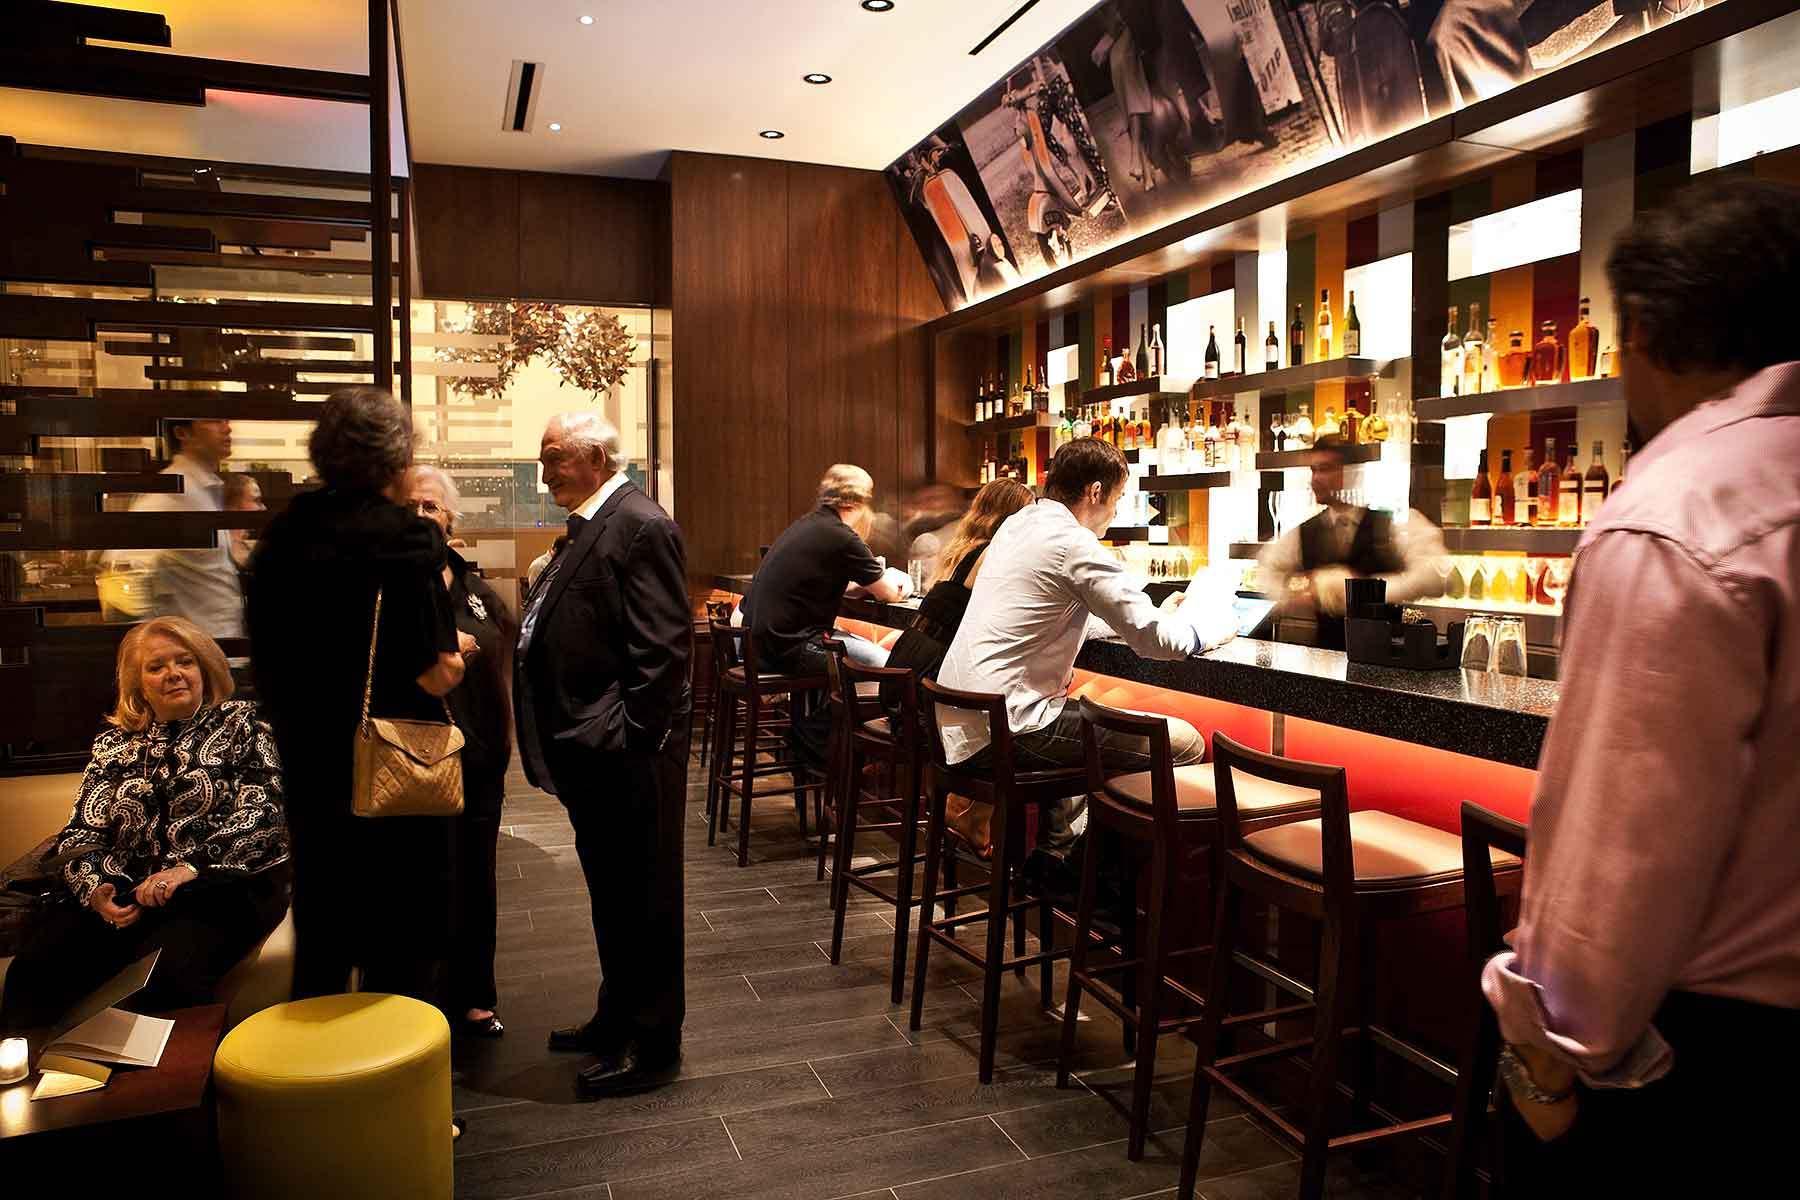 Bibiana Osteria Enoteca is serving 25 special cocktails for Christmas through Dec. 24. (Photo: Greg Powers)